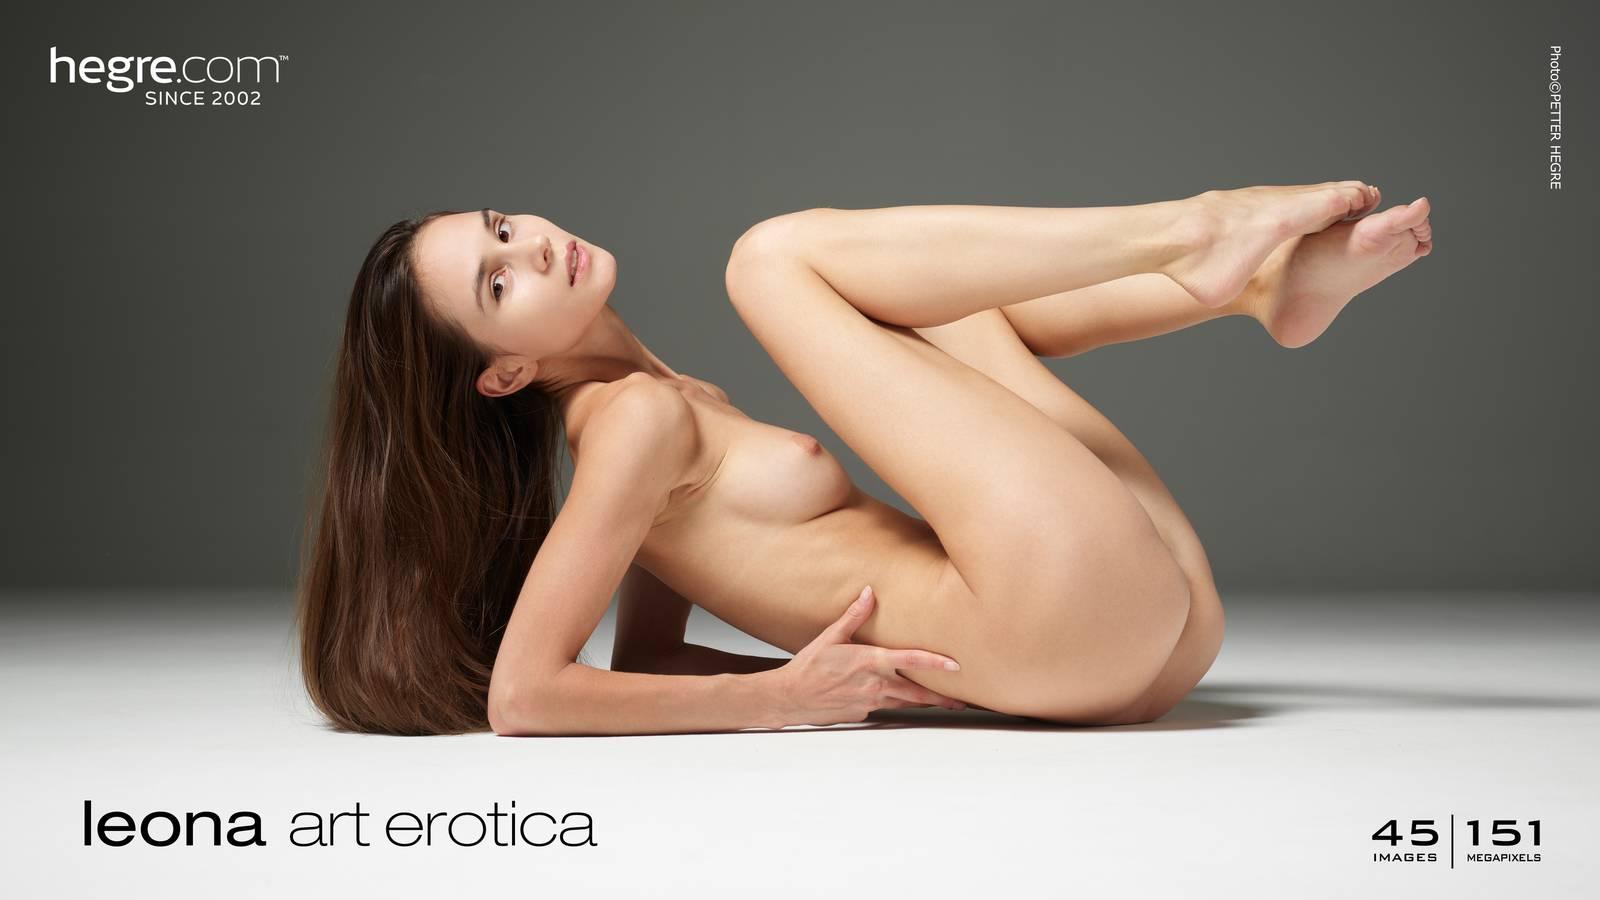 Hegre erotic